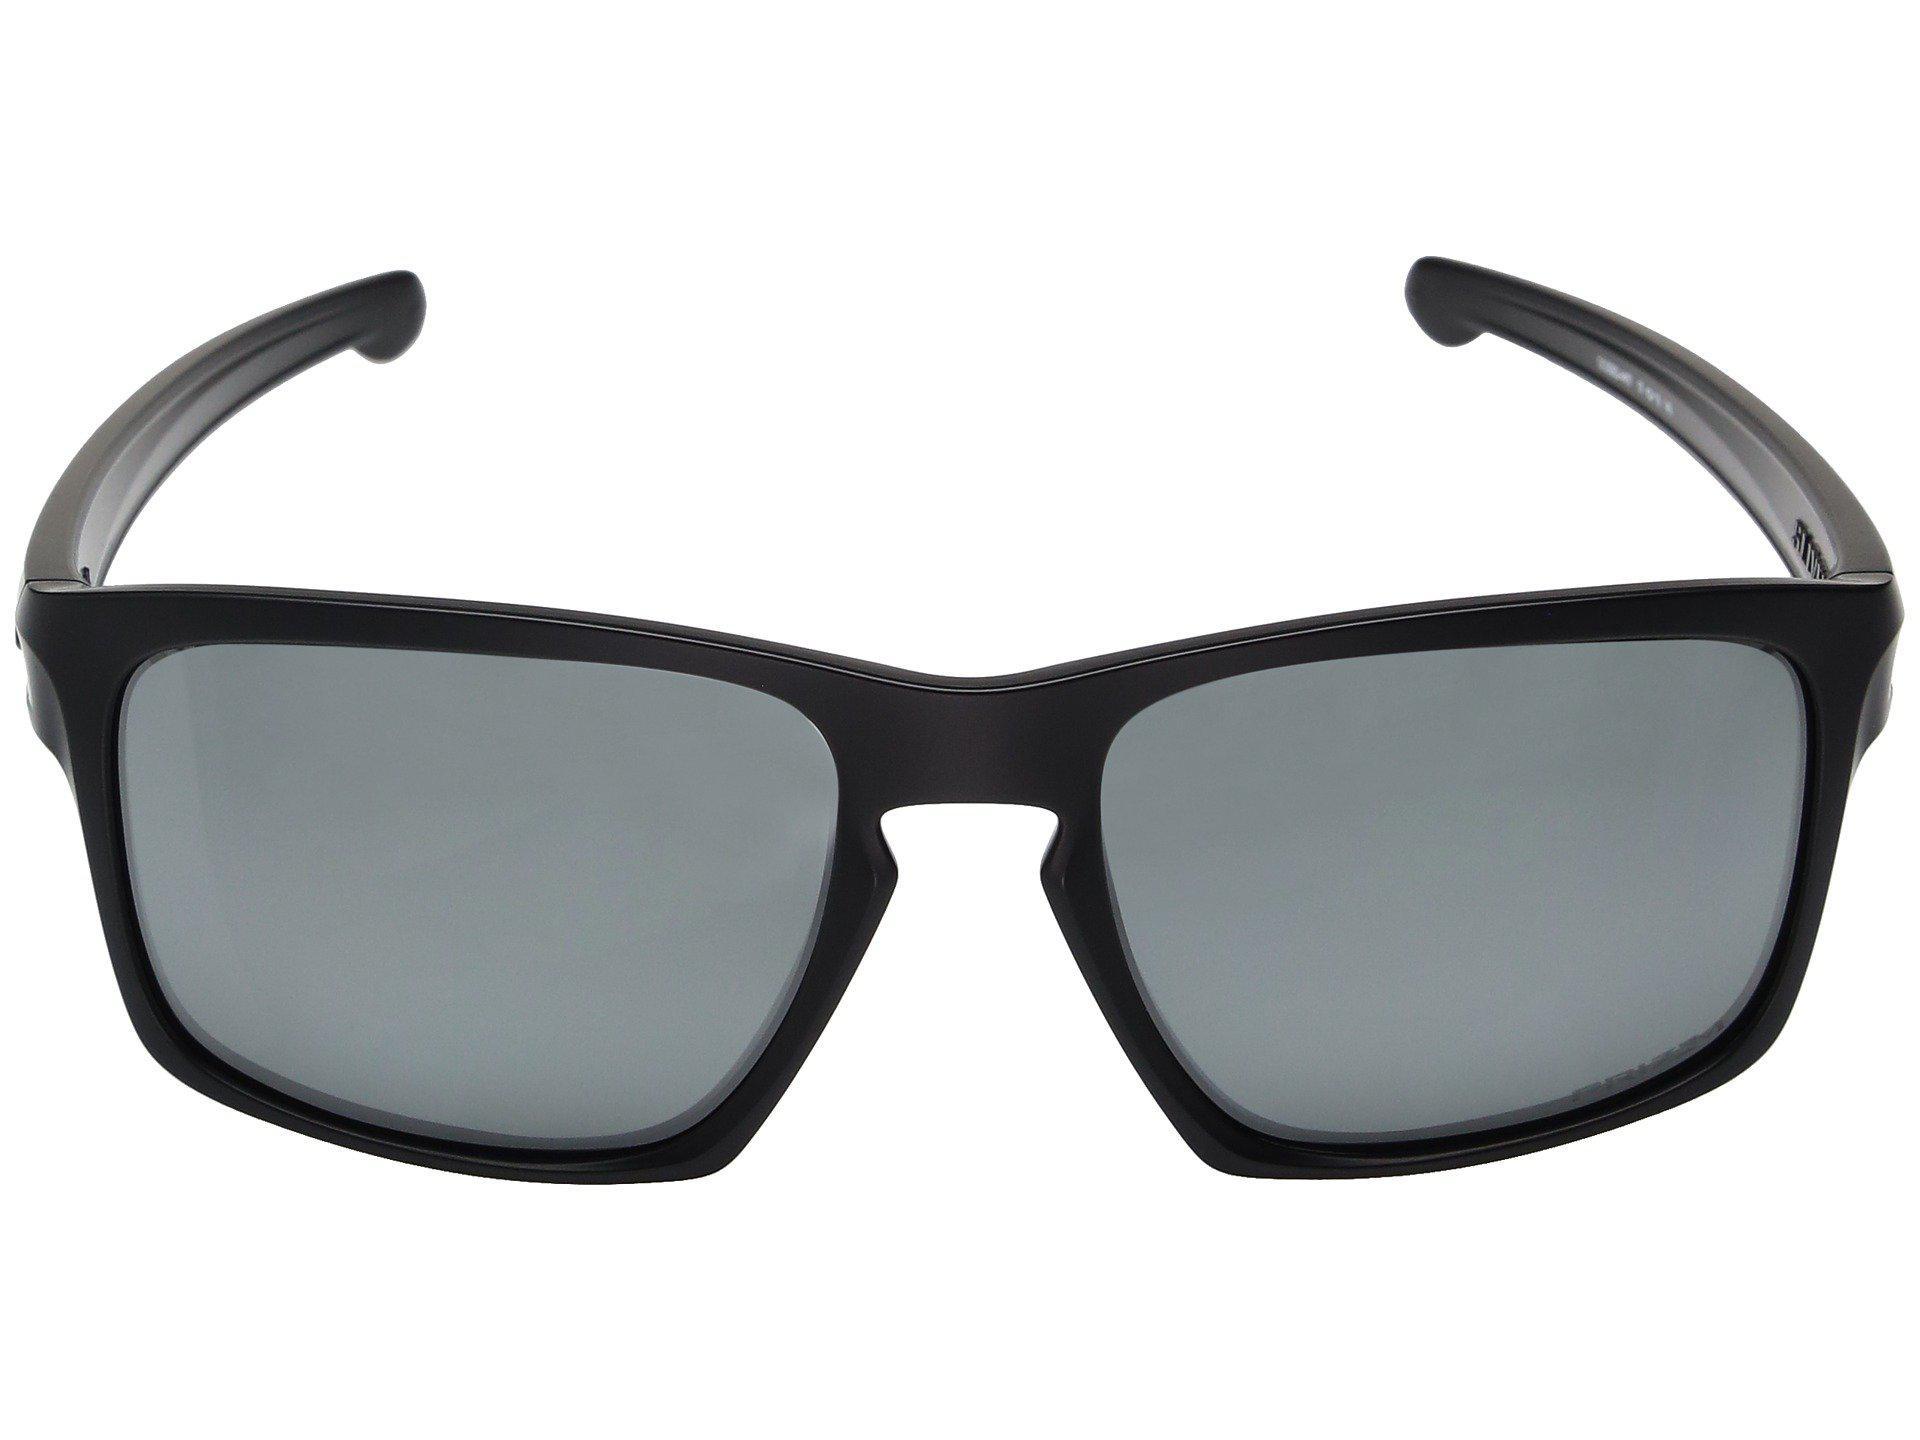 7cecfd3bb1b Oakley - Sliver (matte Black W  Prizm Black Polarized) Fashion Sunglasses  for Men. View fullscreen